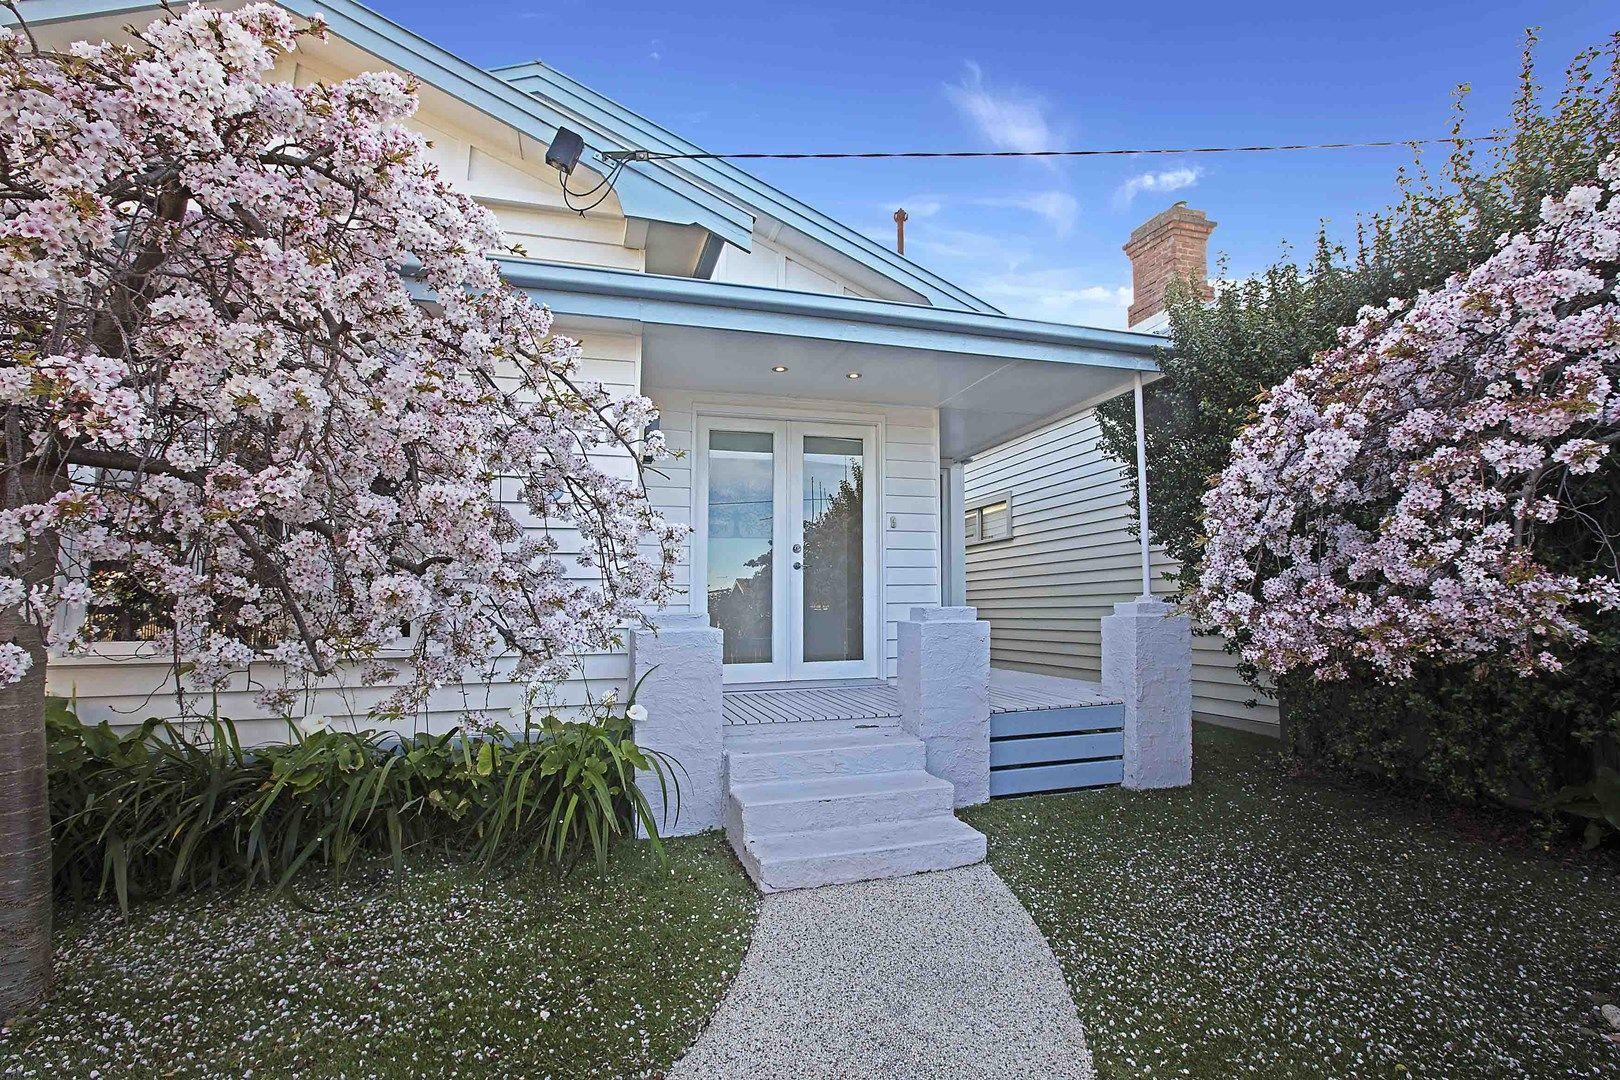 43 Mundy Street, Geelong VIC 3220, Image 0